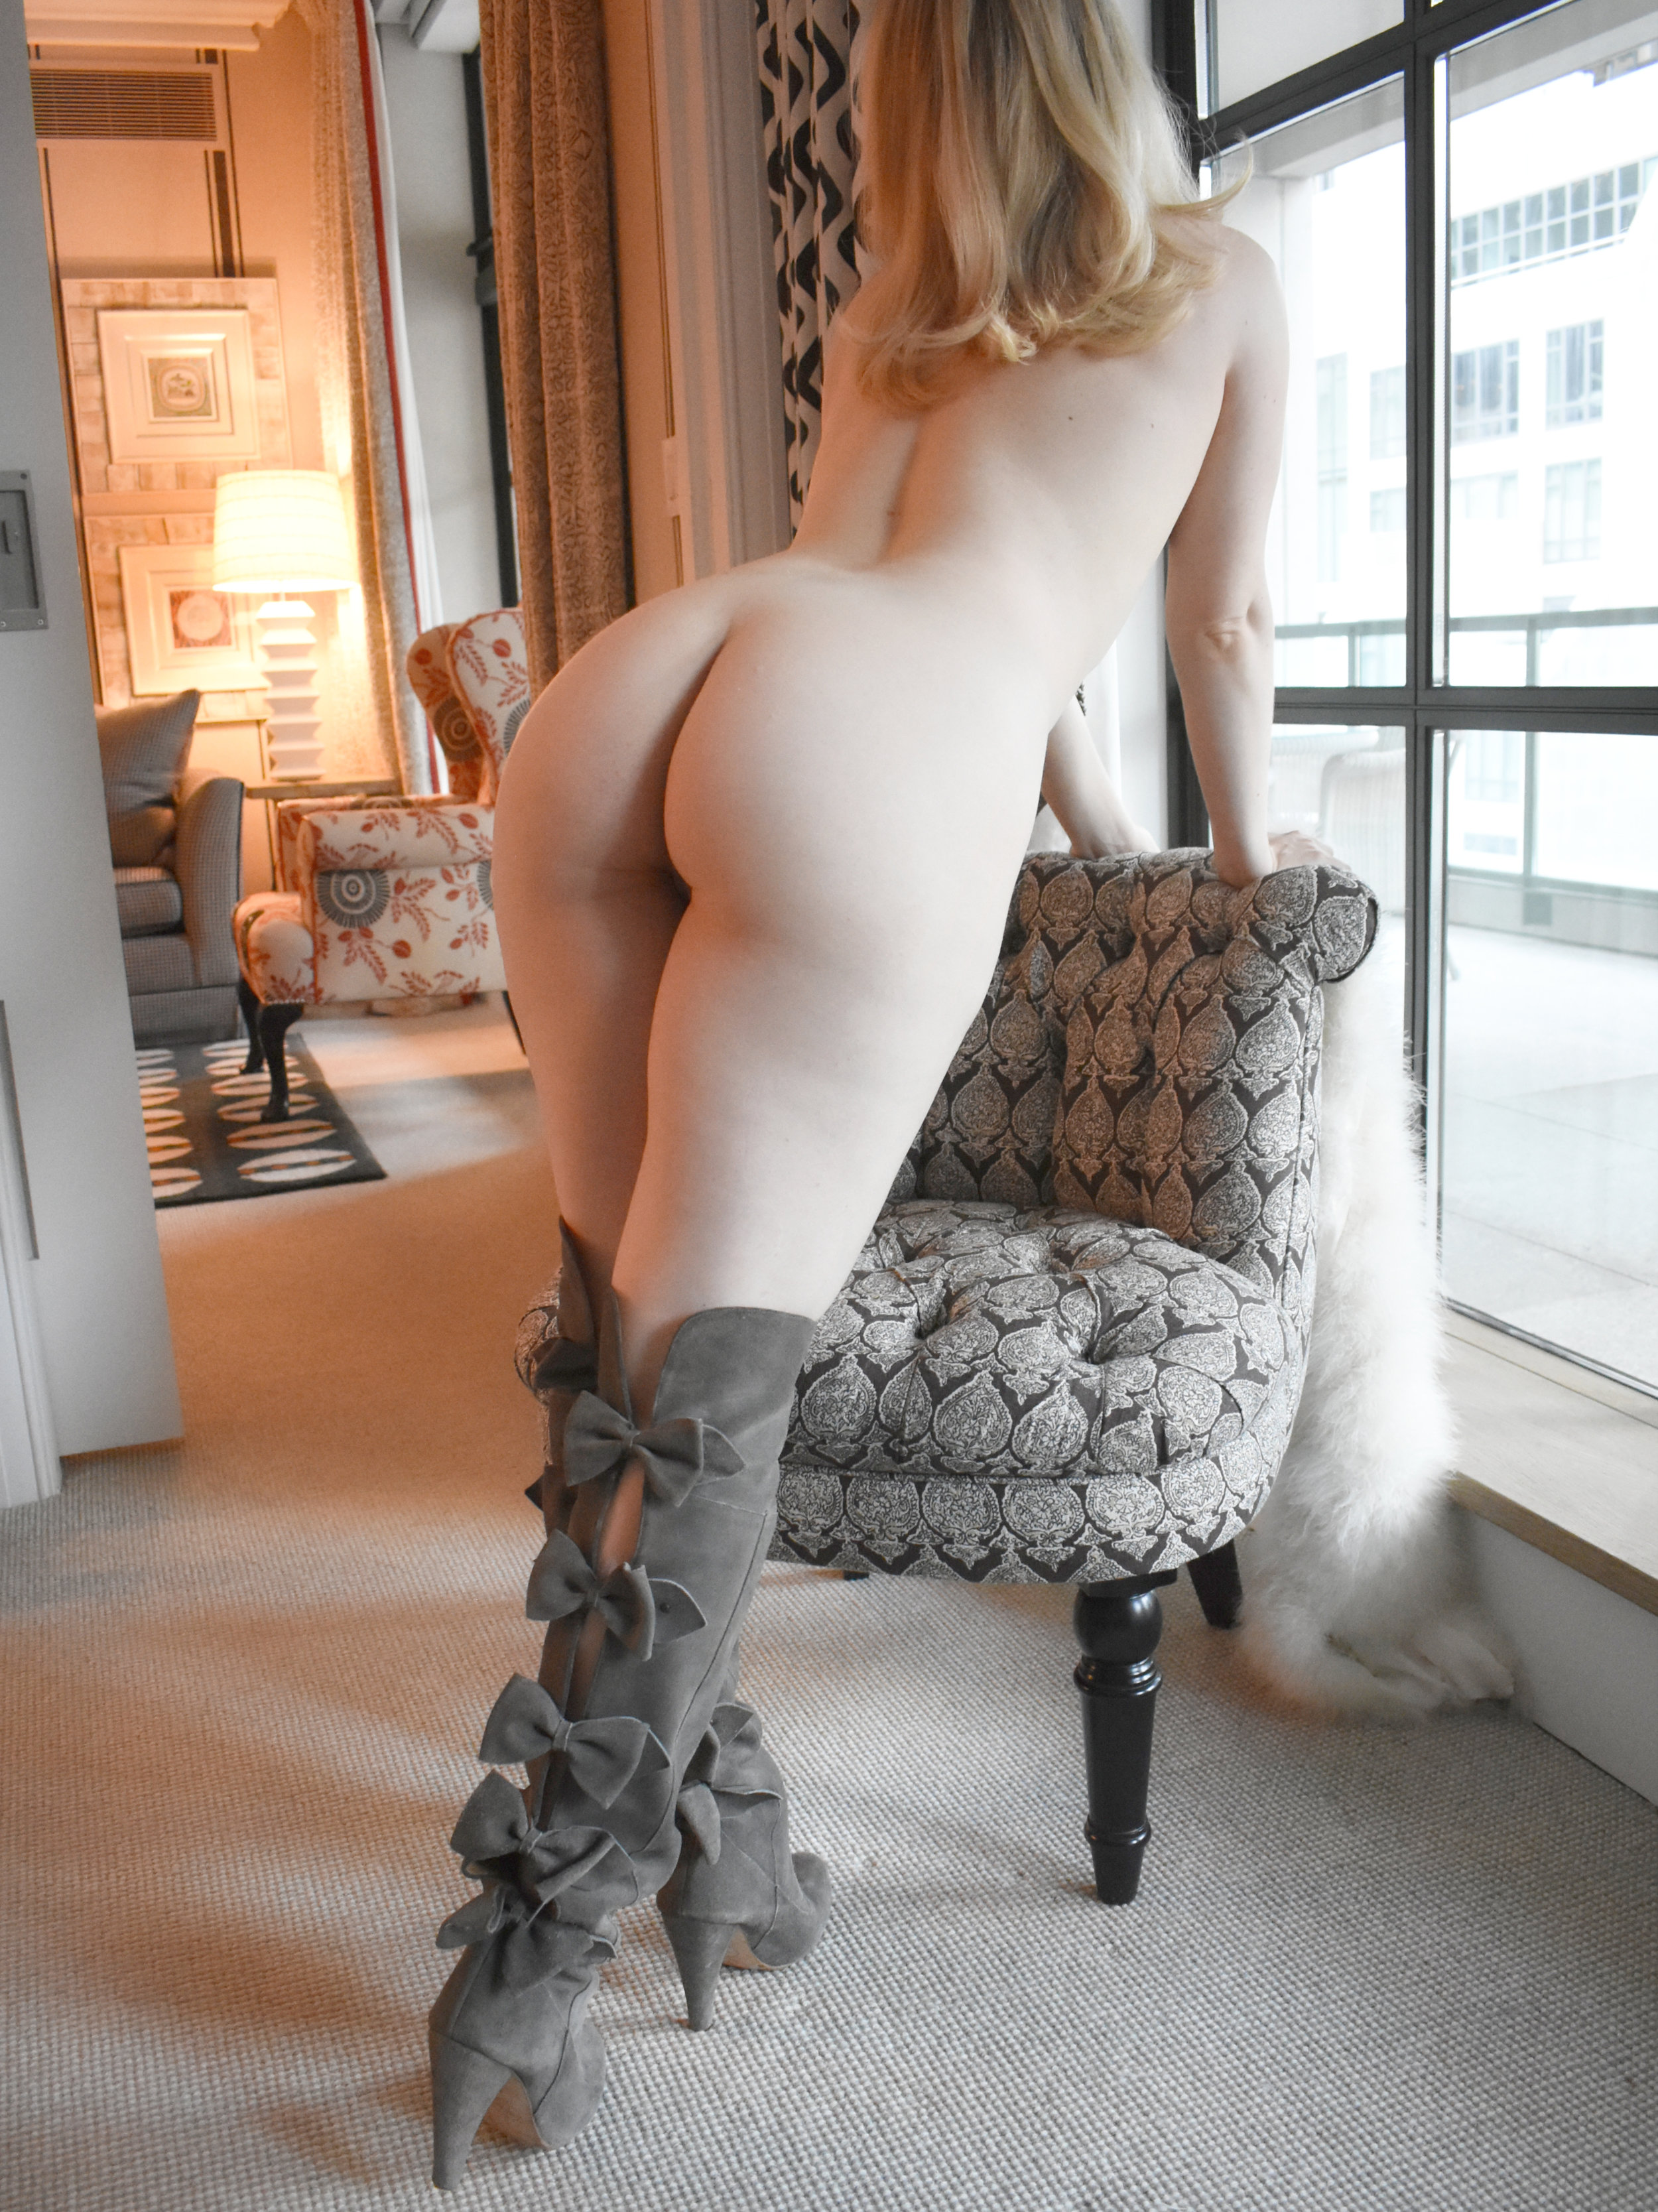 american booty 1.jpg